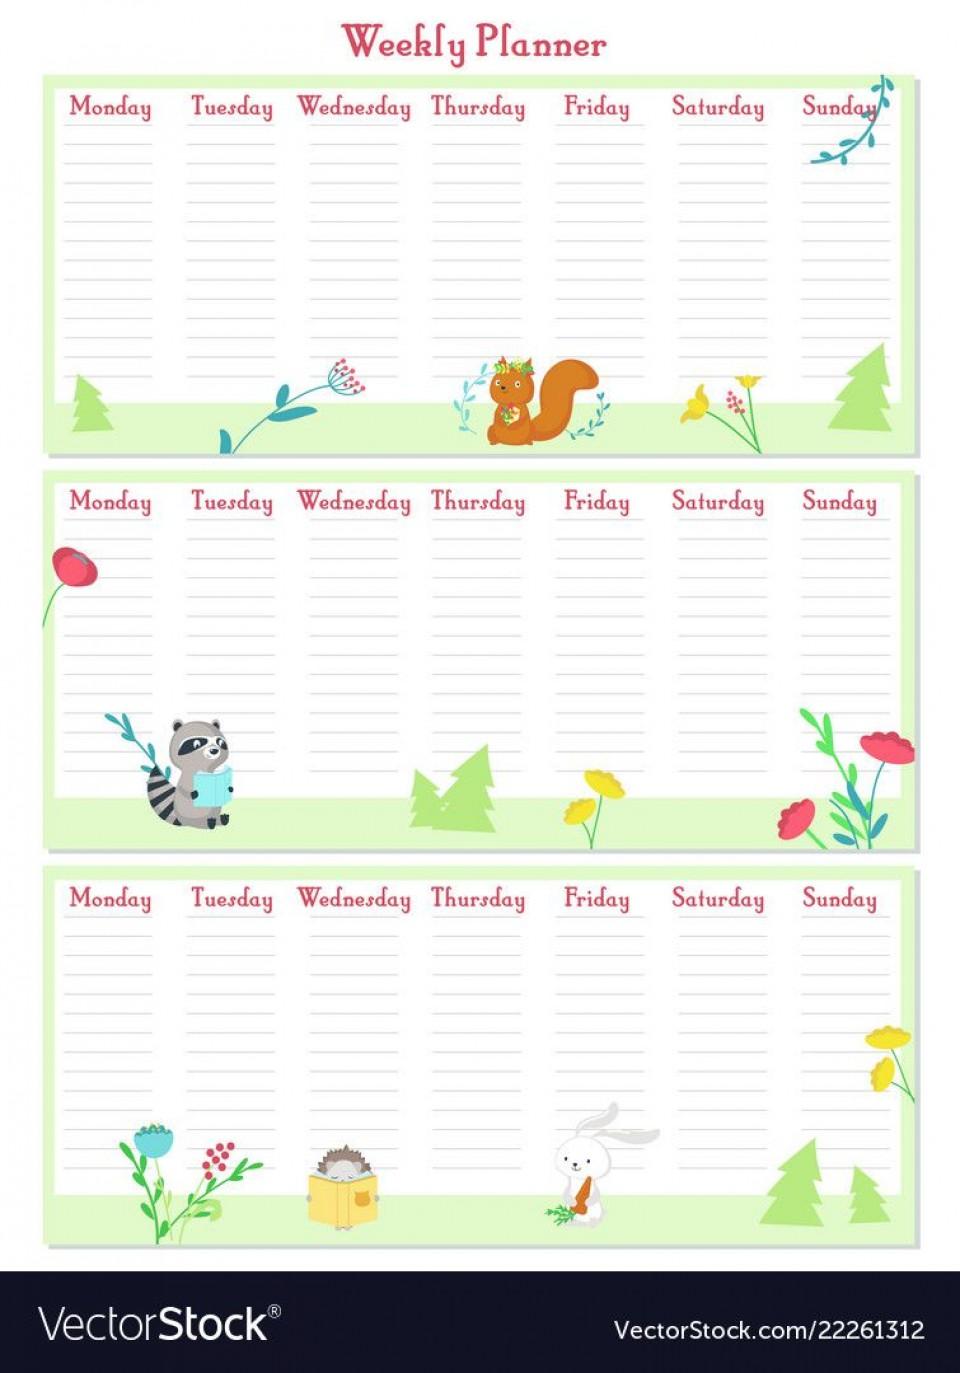 009 Incredible Printable Weekly Planner Template Cute Highest Clarity  Free Calendar960